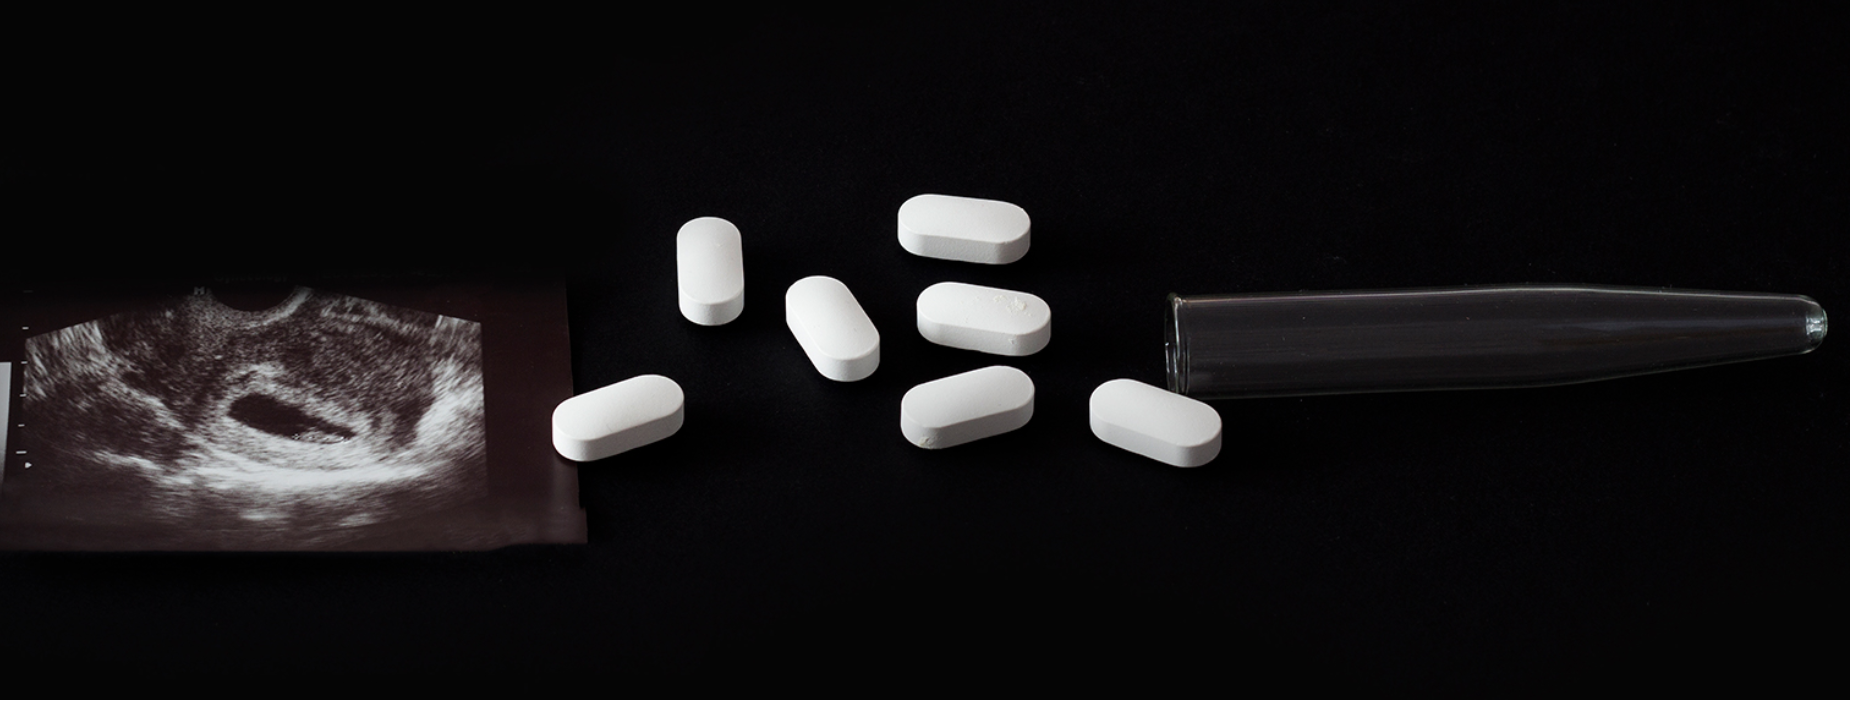 ERLC abortion pill